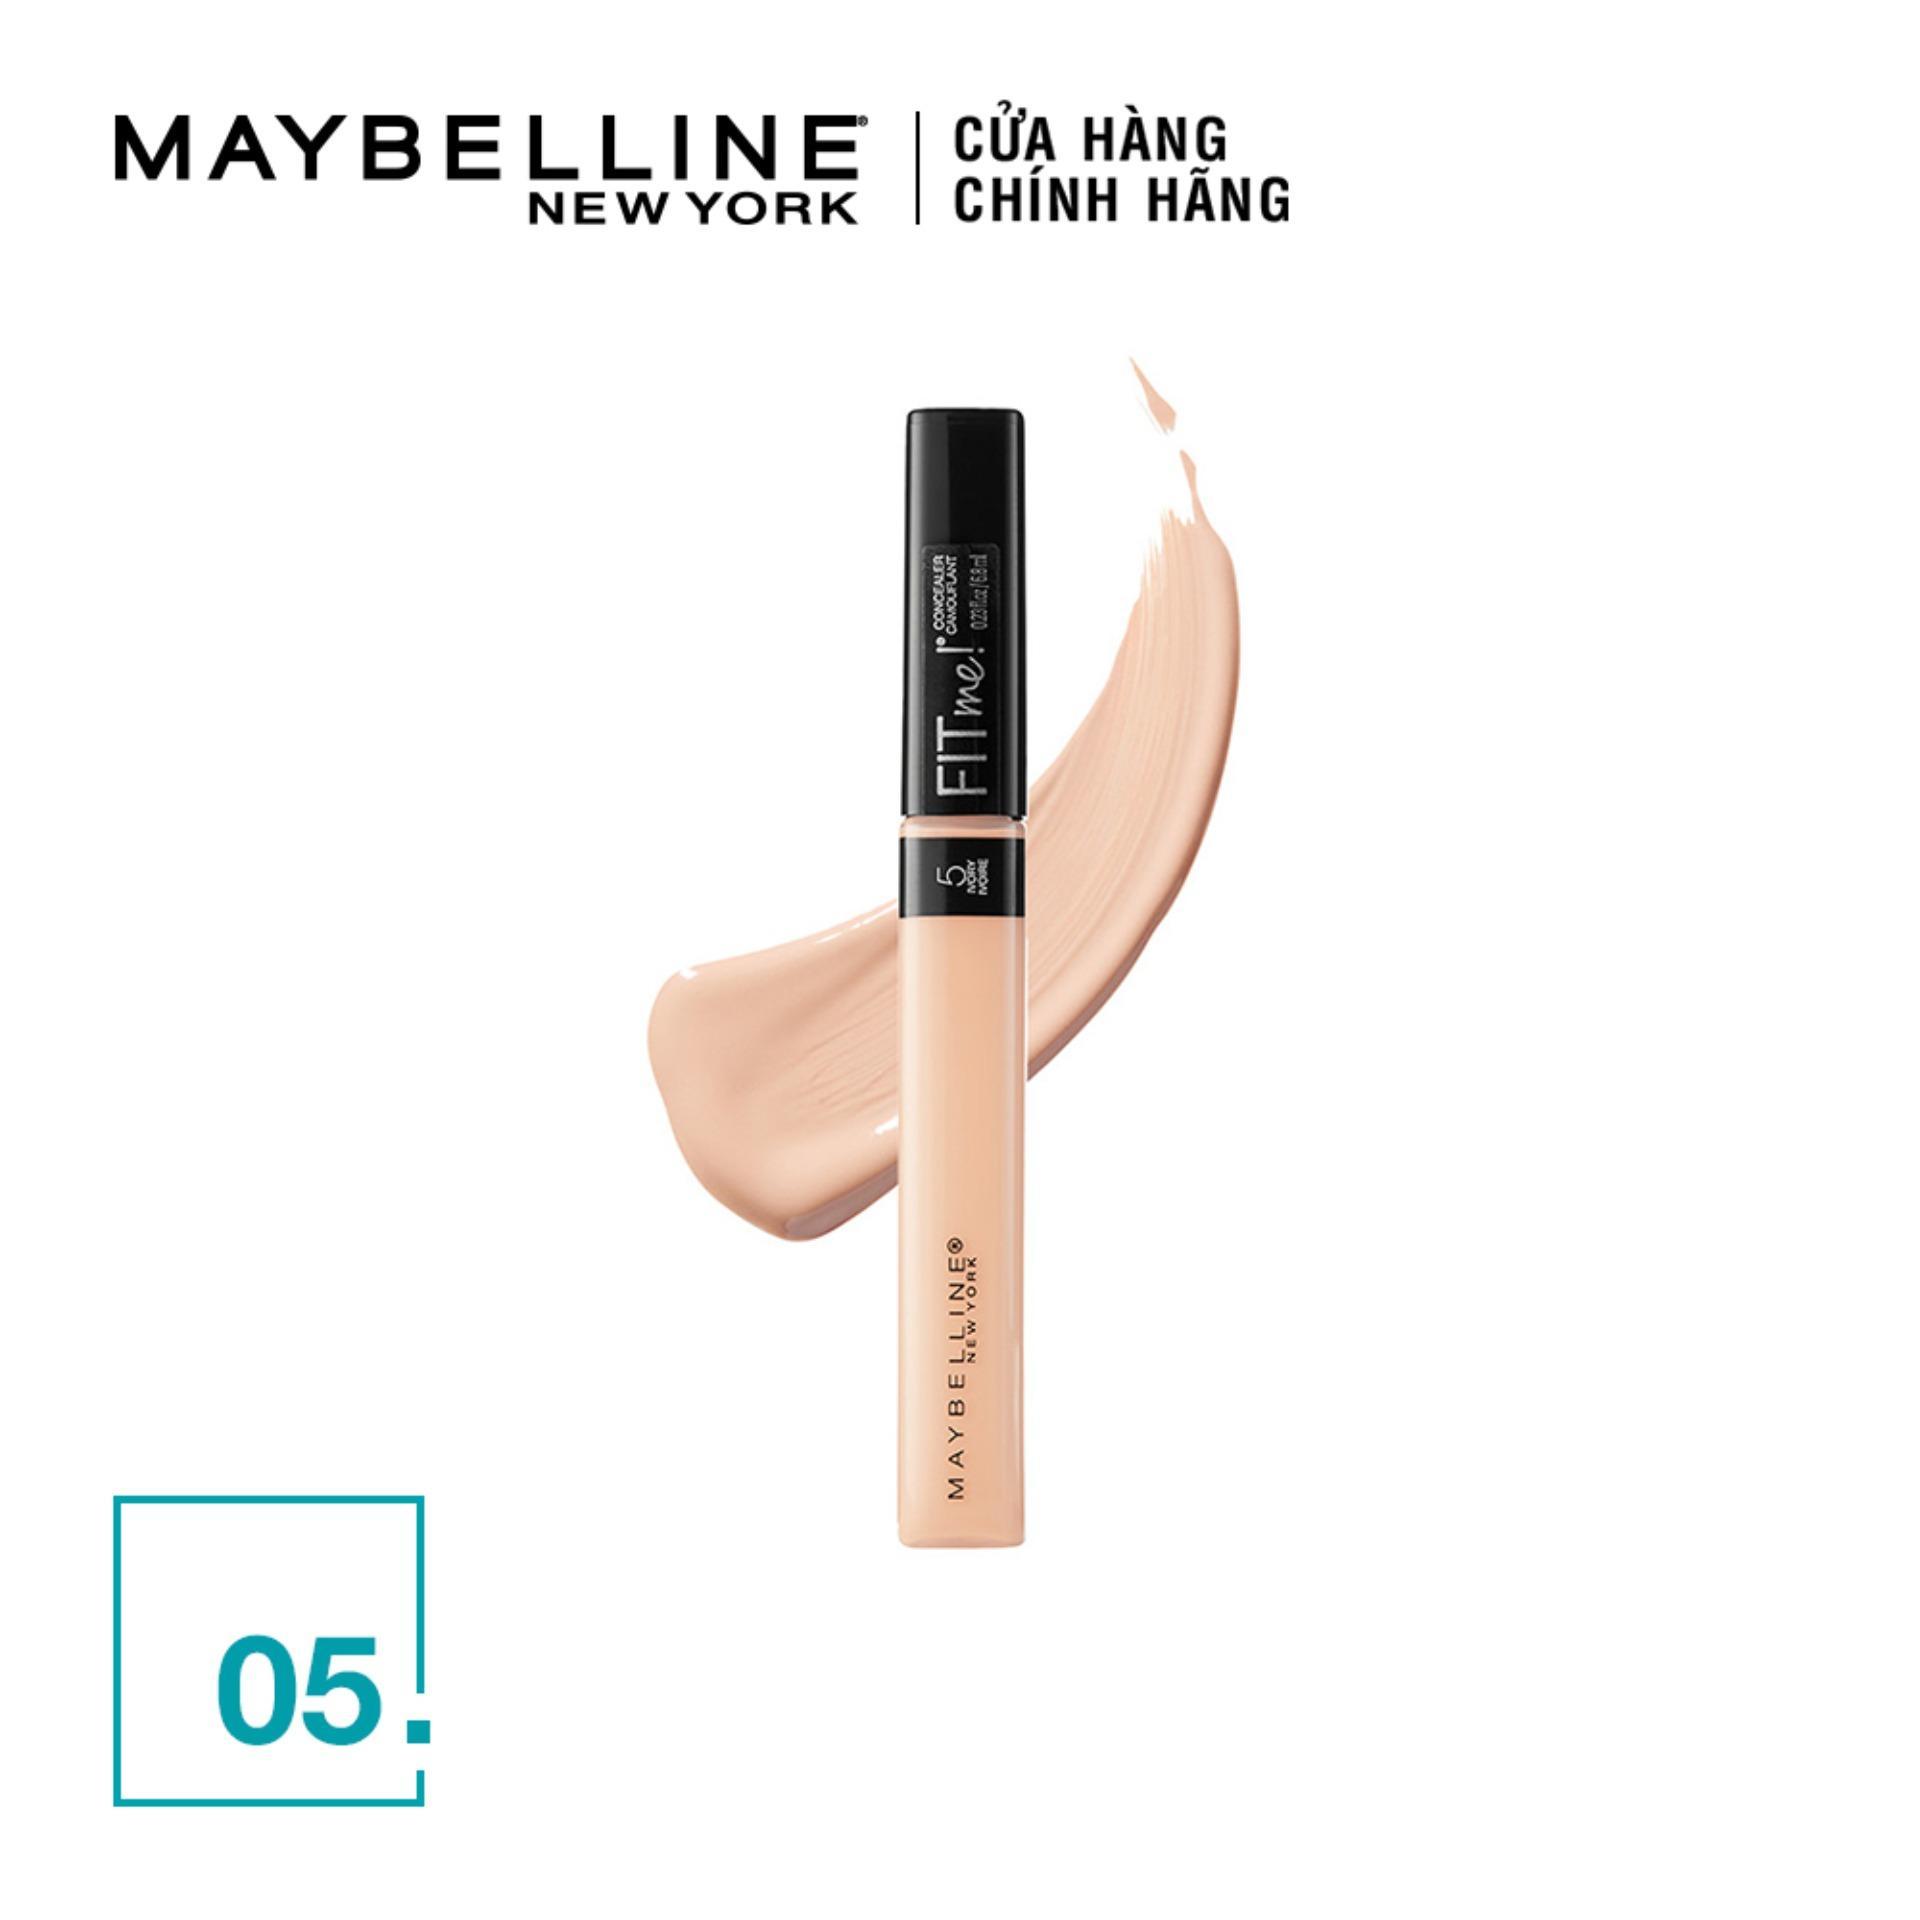 Kem che khuyết điểm đa năng Maybelline New York Fit Me Concealer 6.8ml Nhật Bản